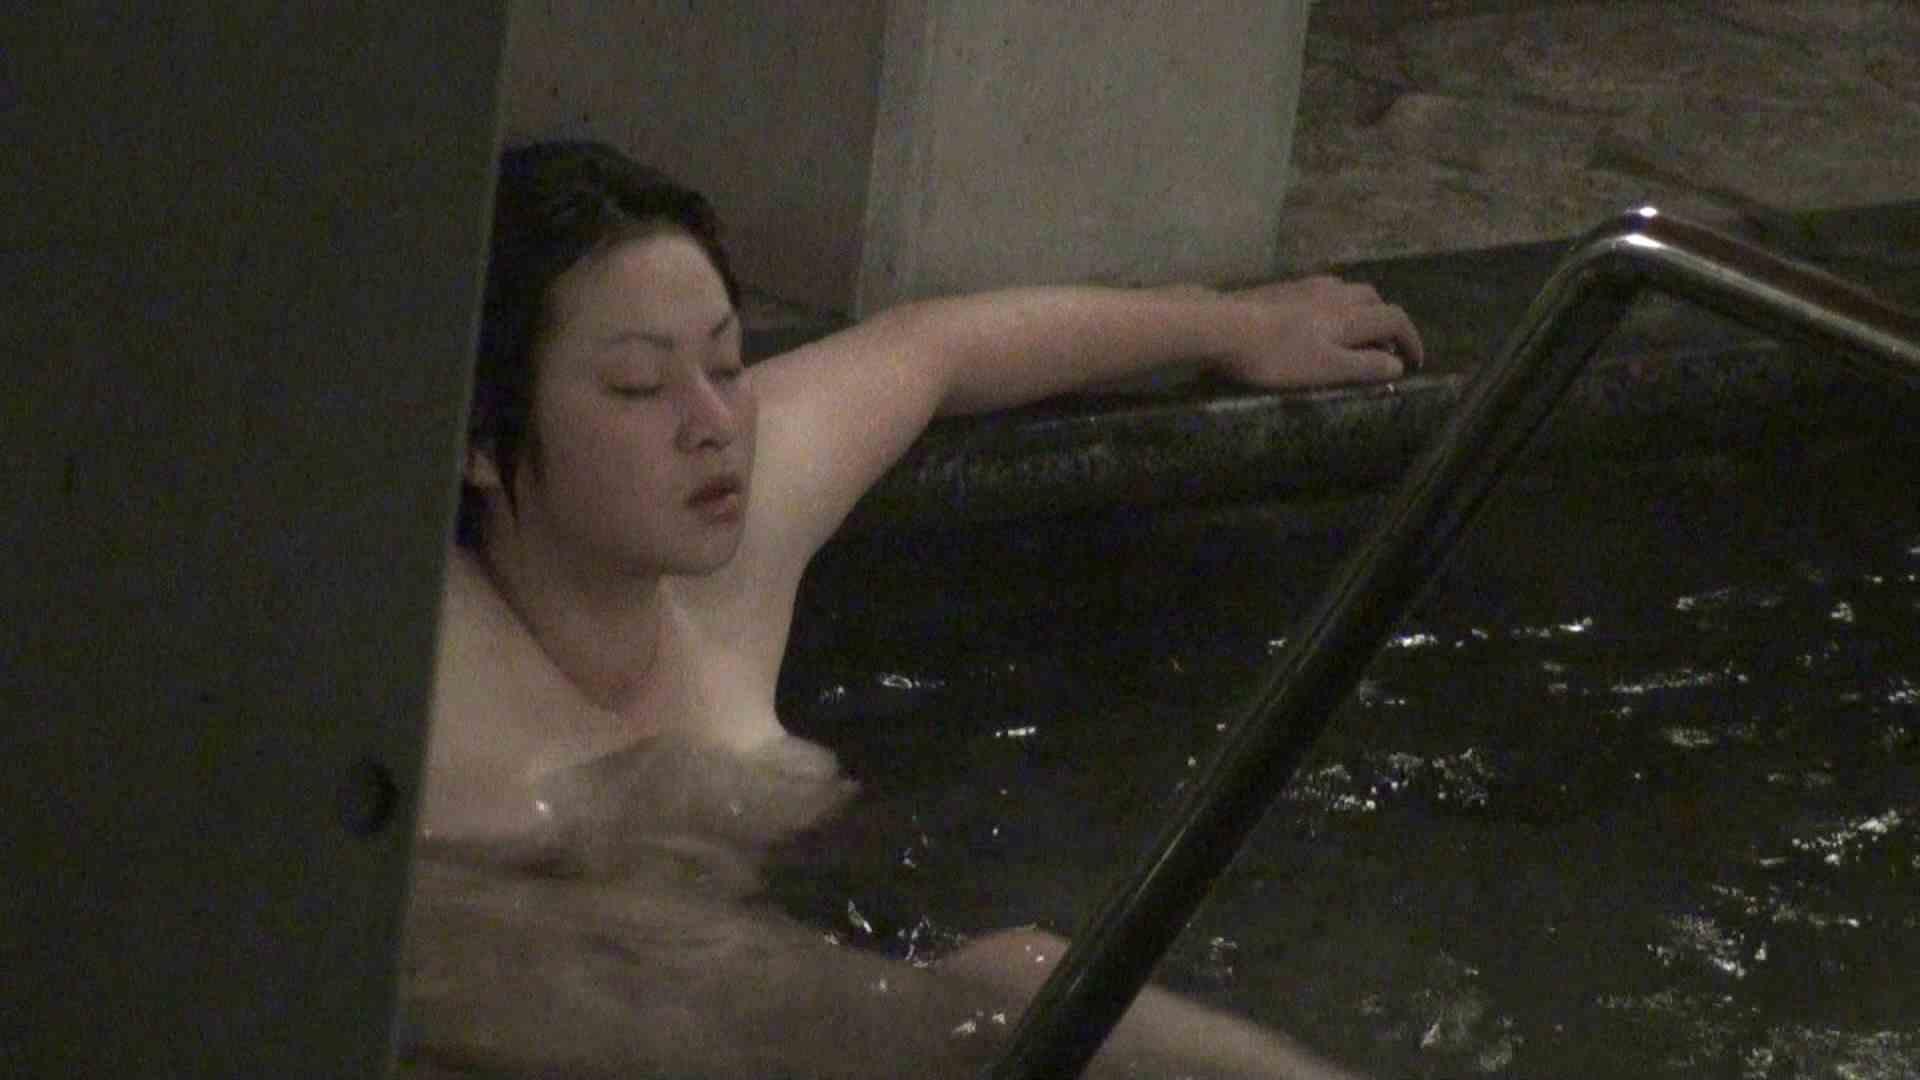 Aquaな露天風呂Vol.338 露天風呂編 | 盗撮シリーズ  82PIX 53